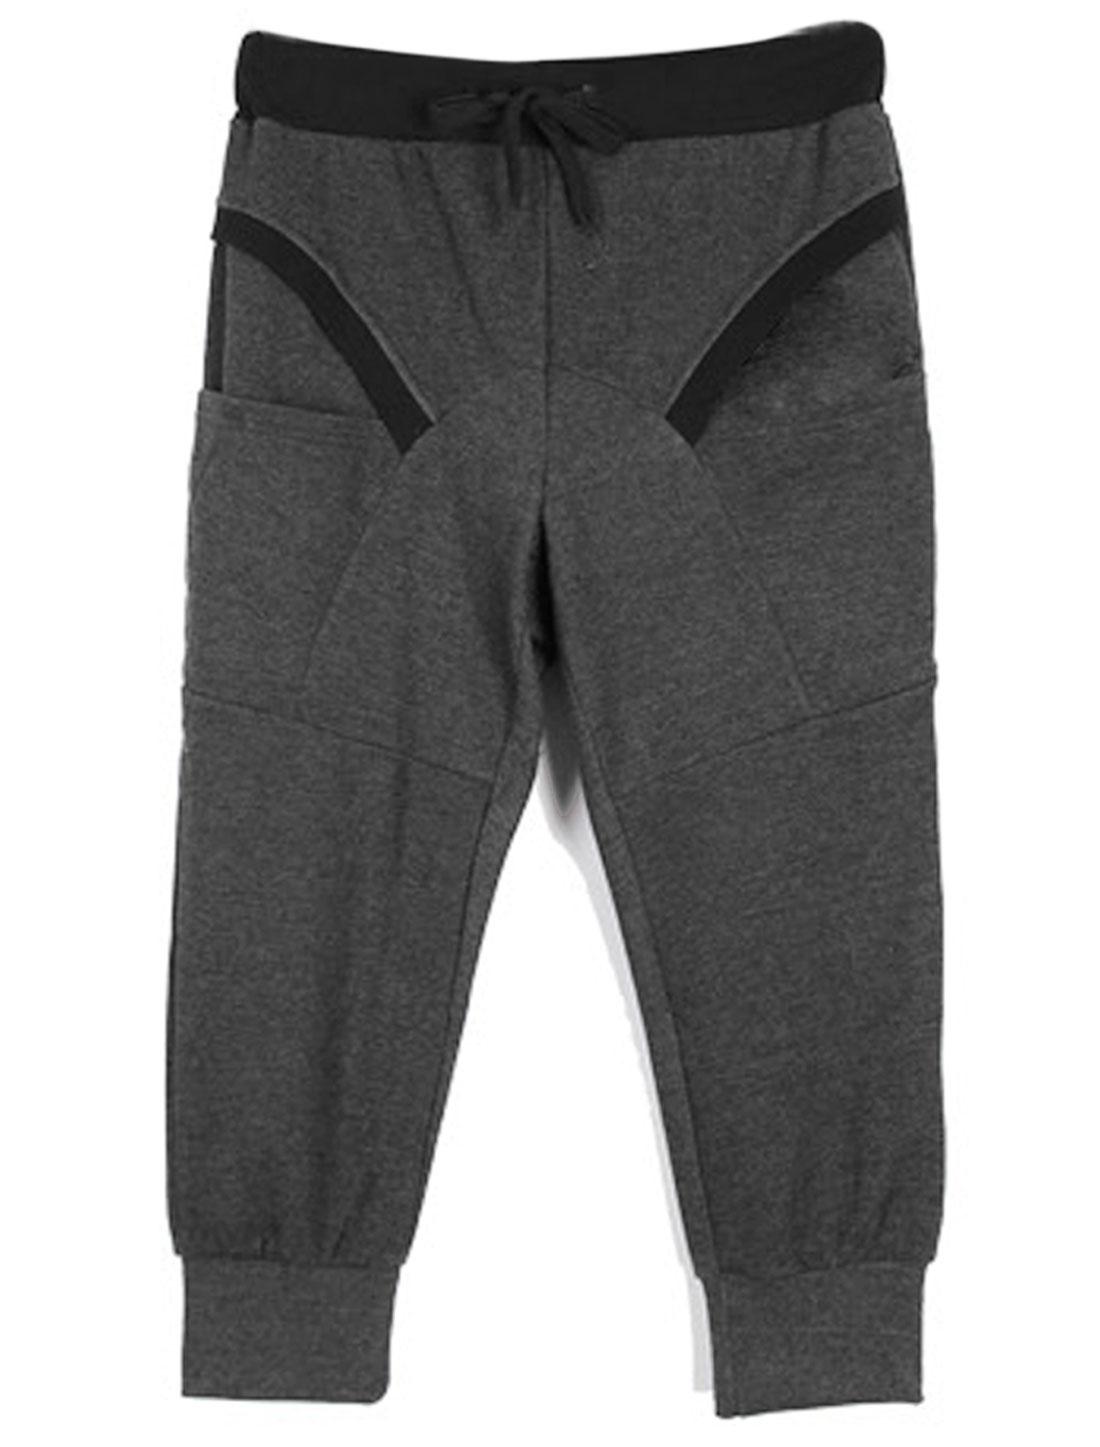 Mens Dark Gray Drawstring Elastic Waist Short Trousers W36